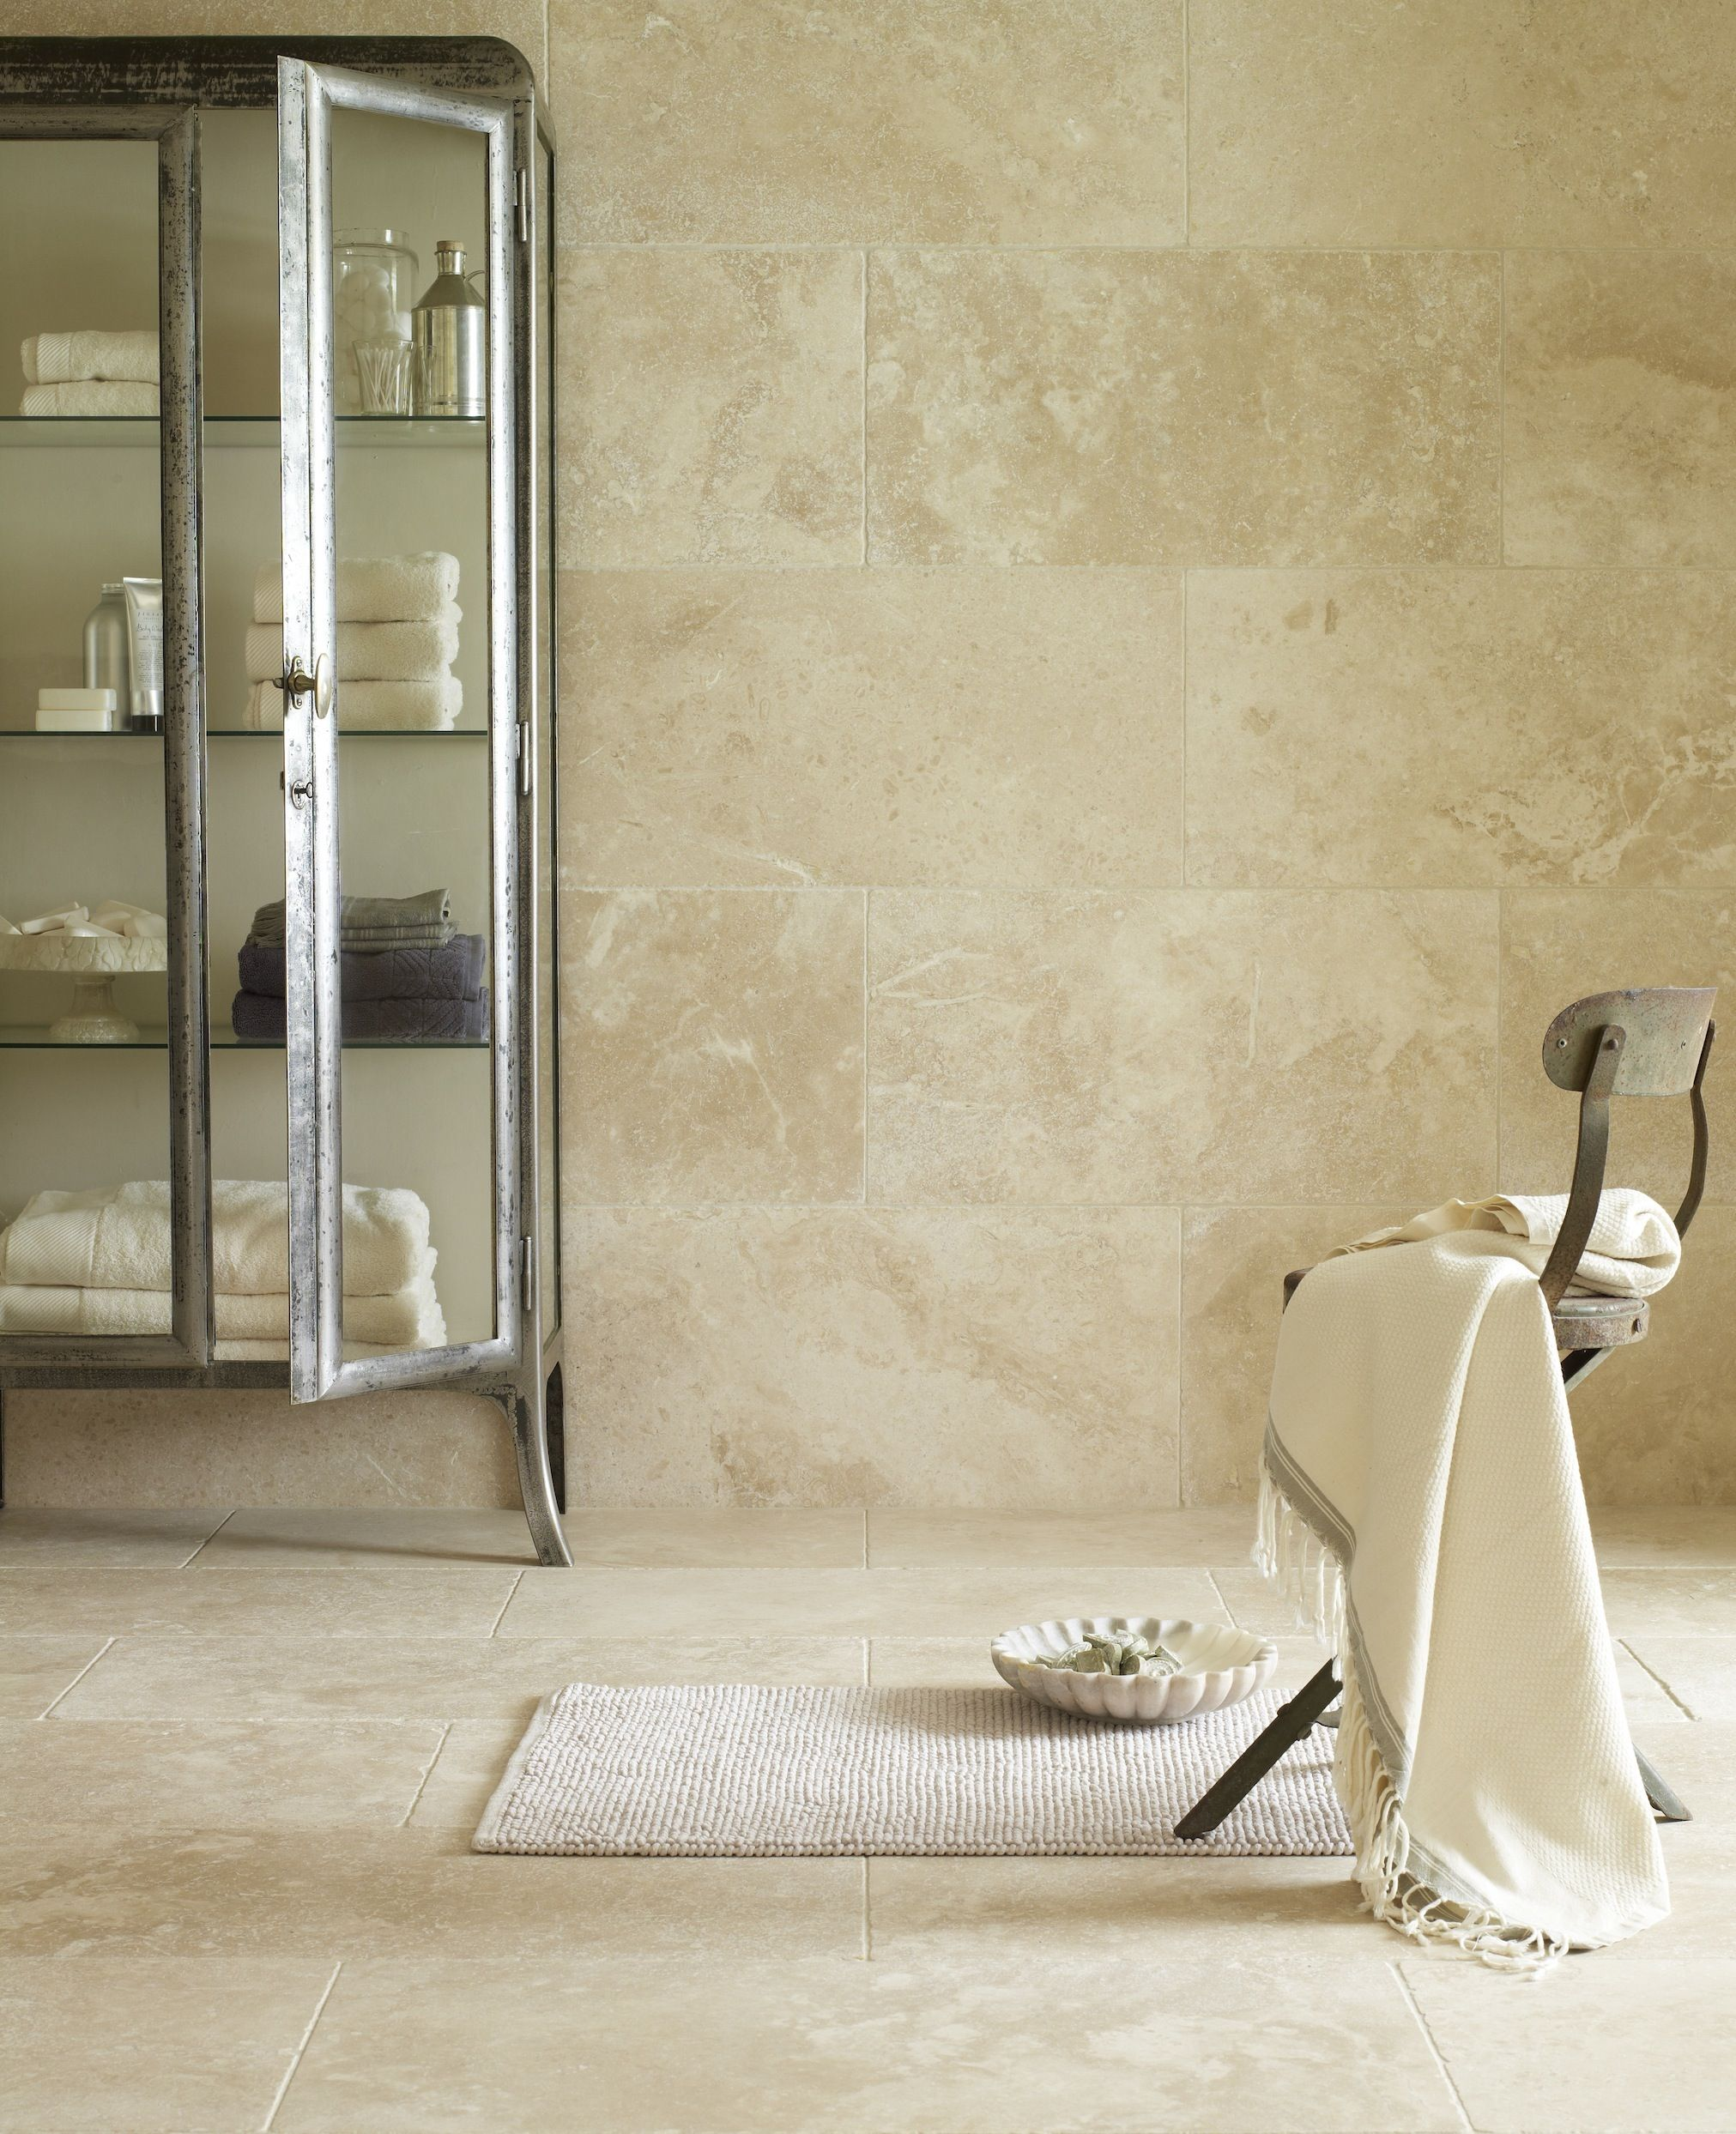 Corinth Tumbled Travertine Tile | Walls | Pinterest | Stone tiles ...